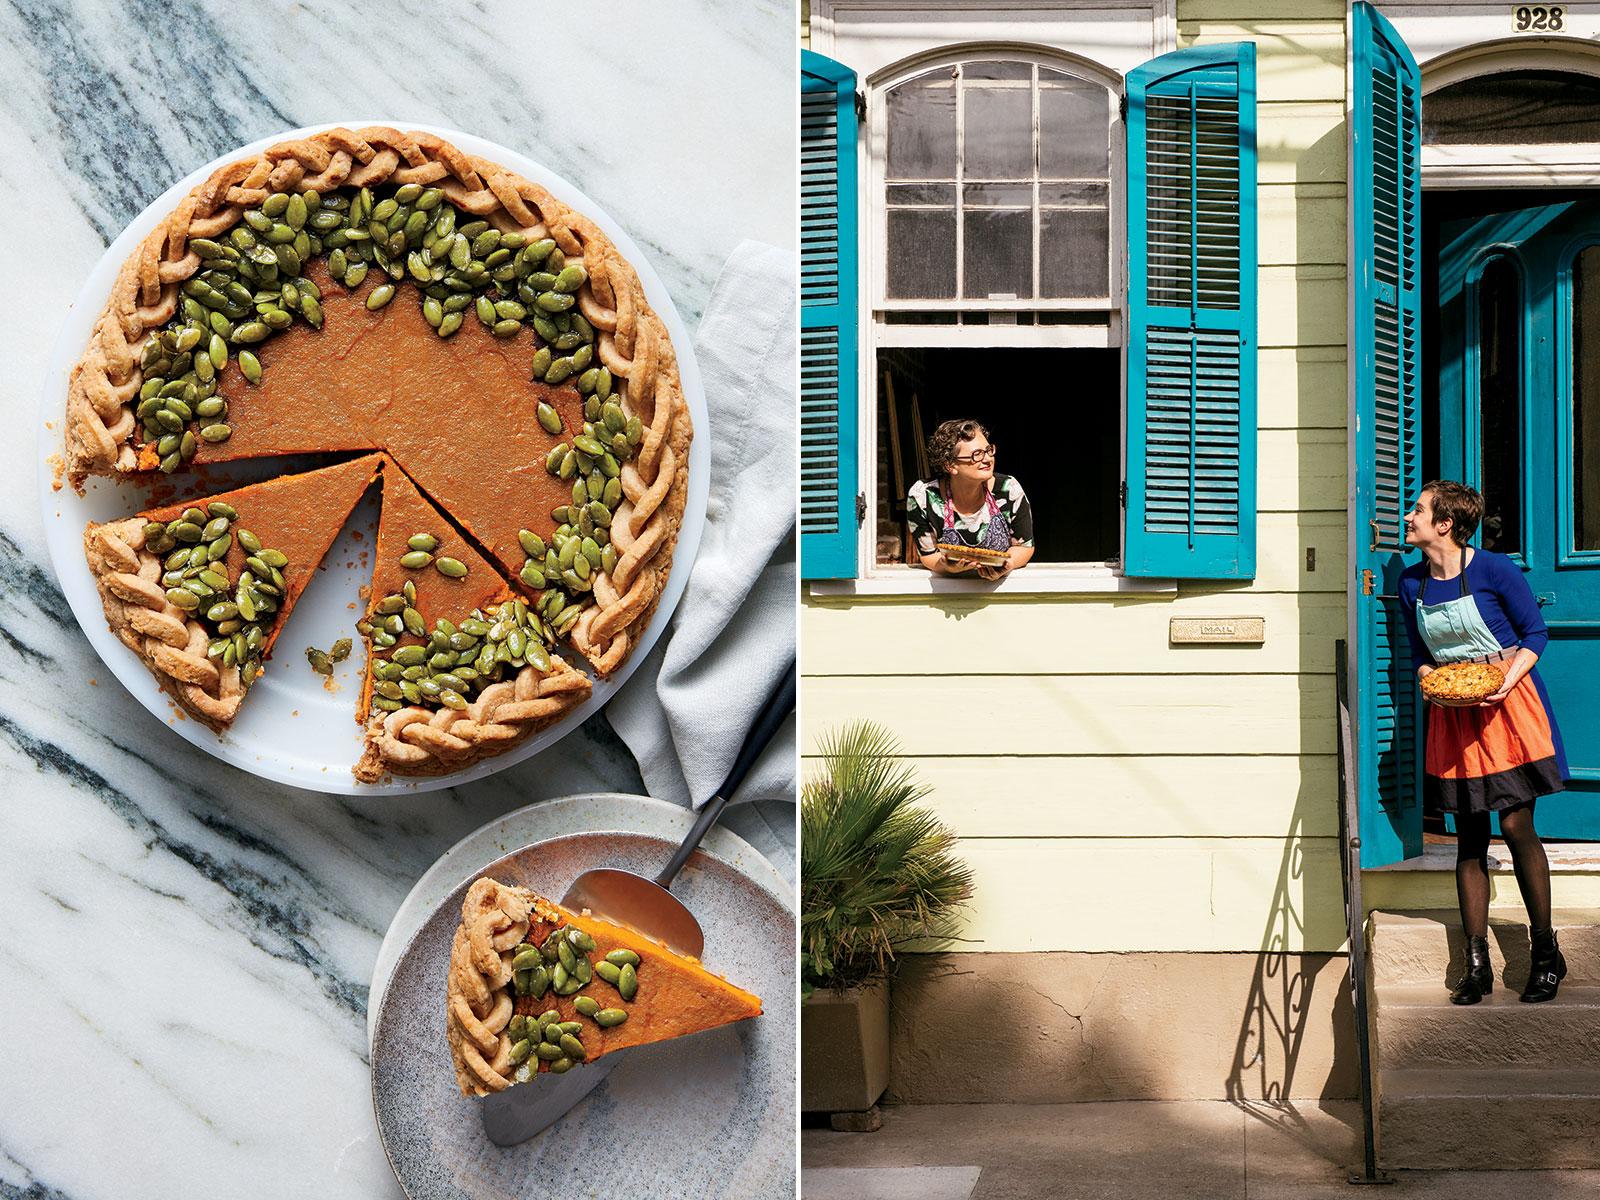 pies-nicole-eiden-and-marielle-dupre-ft-mag1118.jpg